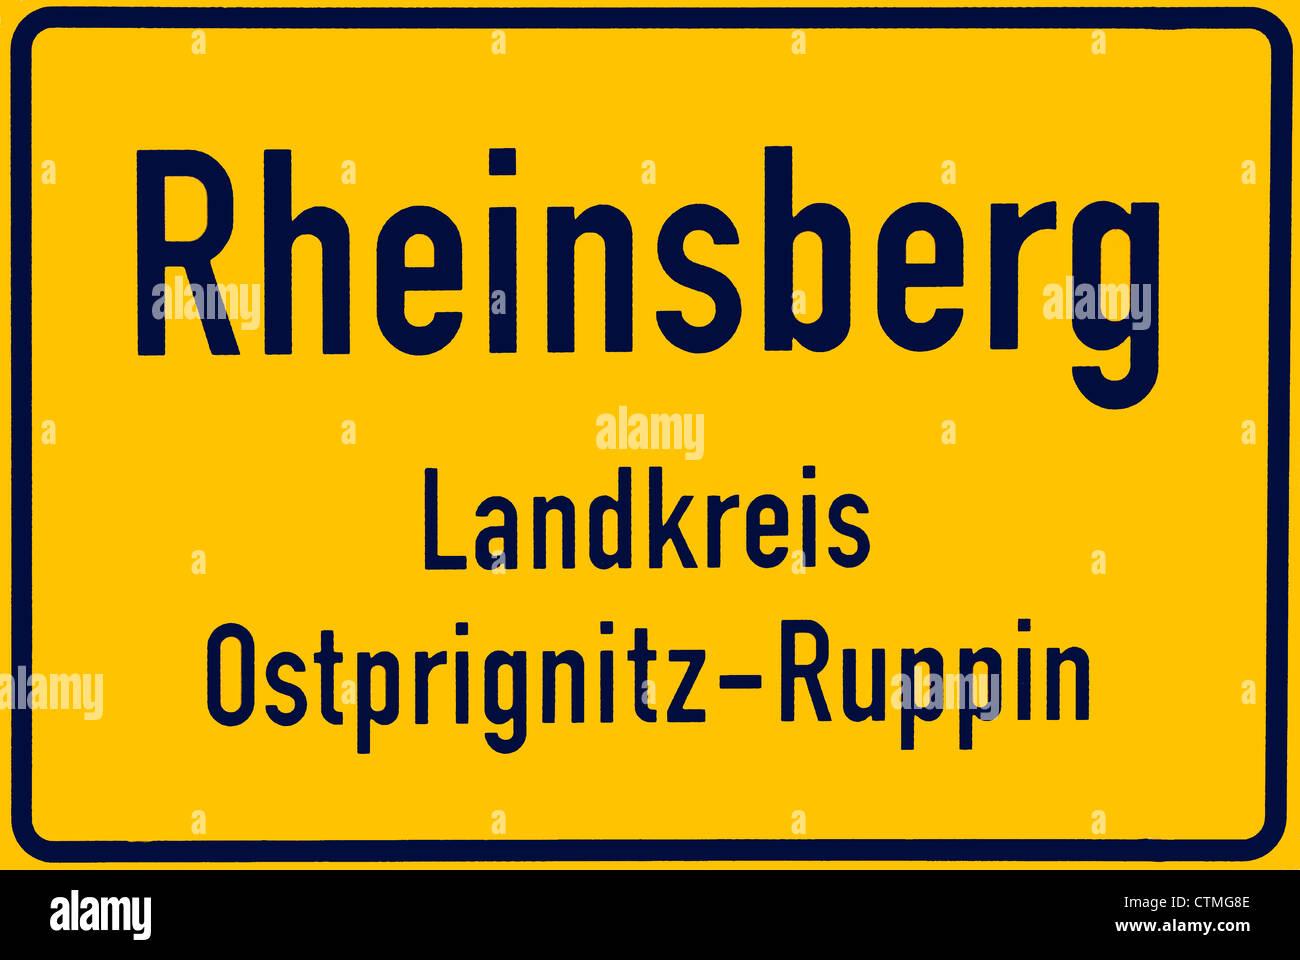 Place name sign of Rheinsberg in Brandenburg. - Stock Image